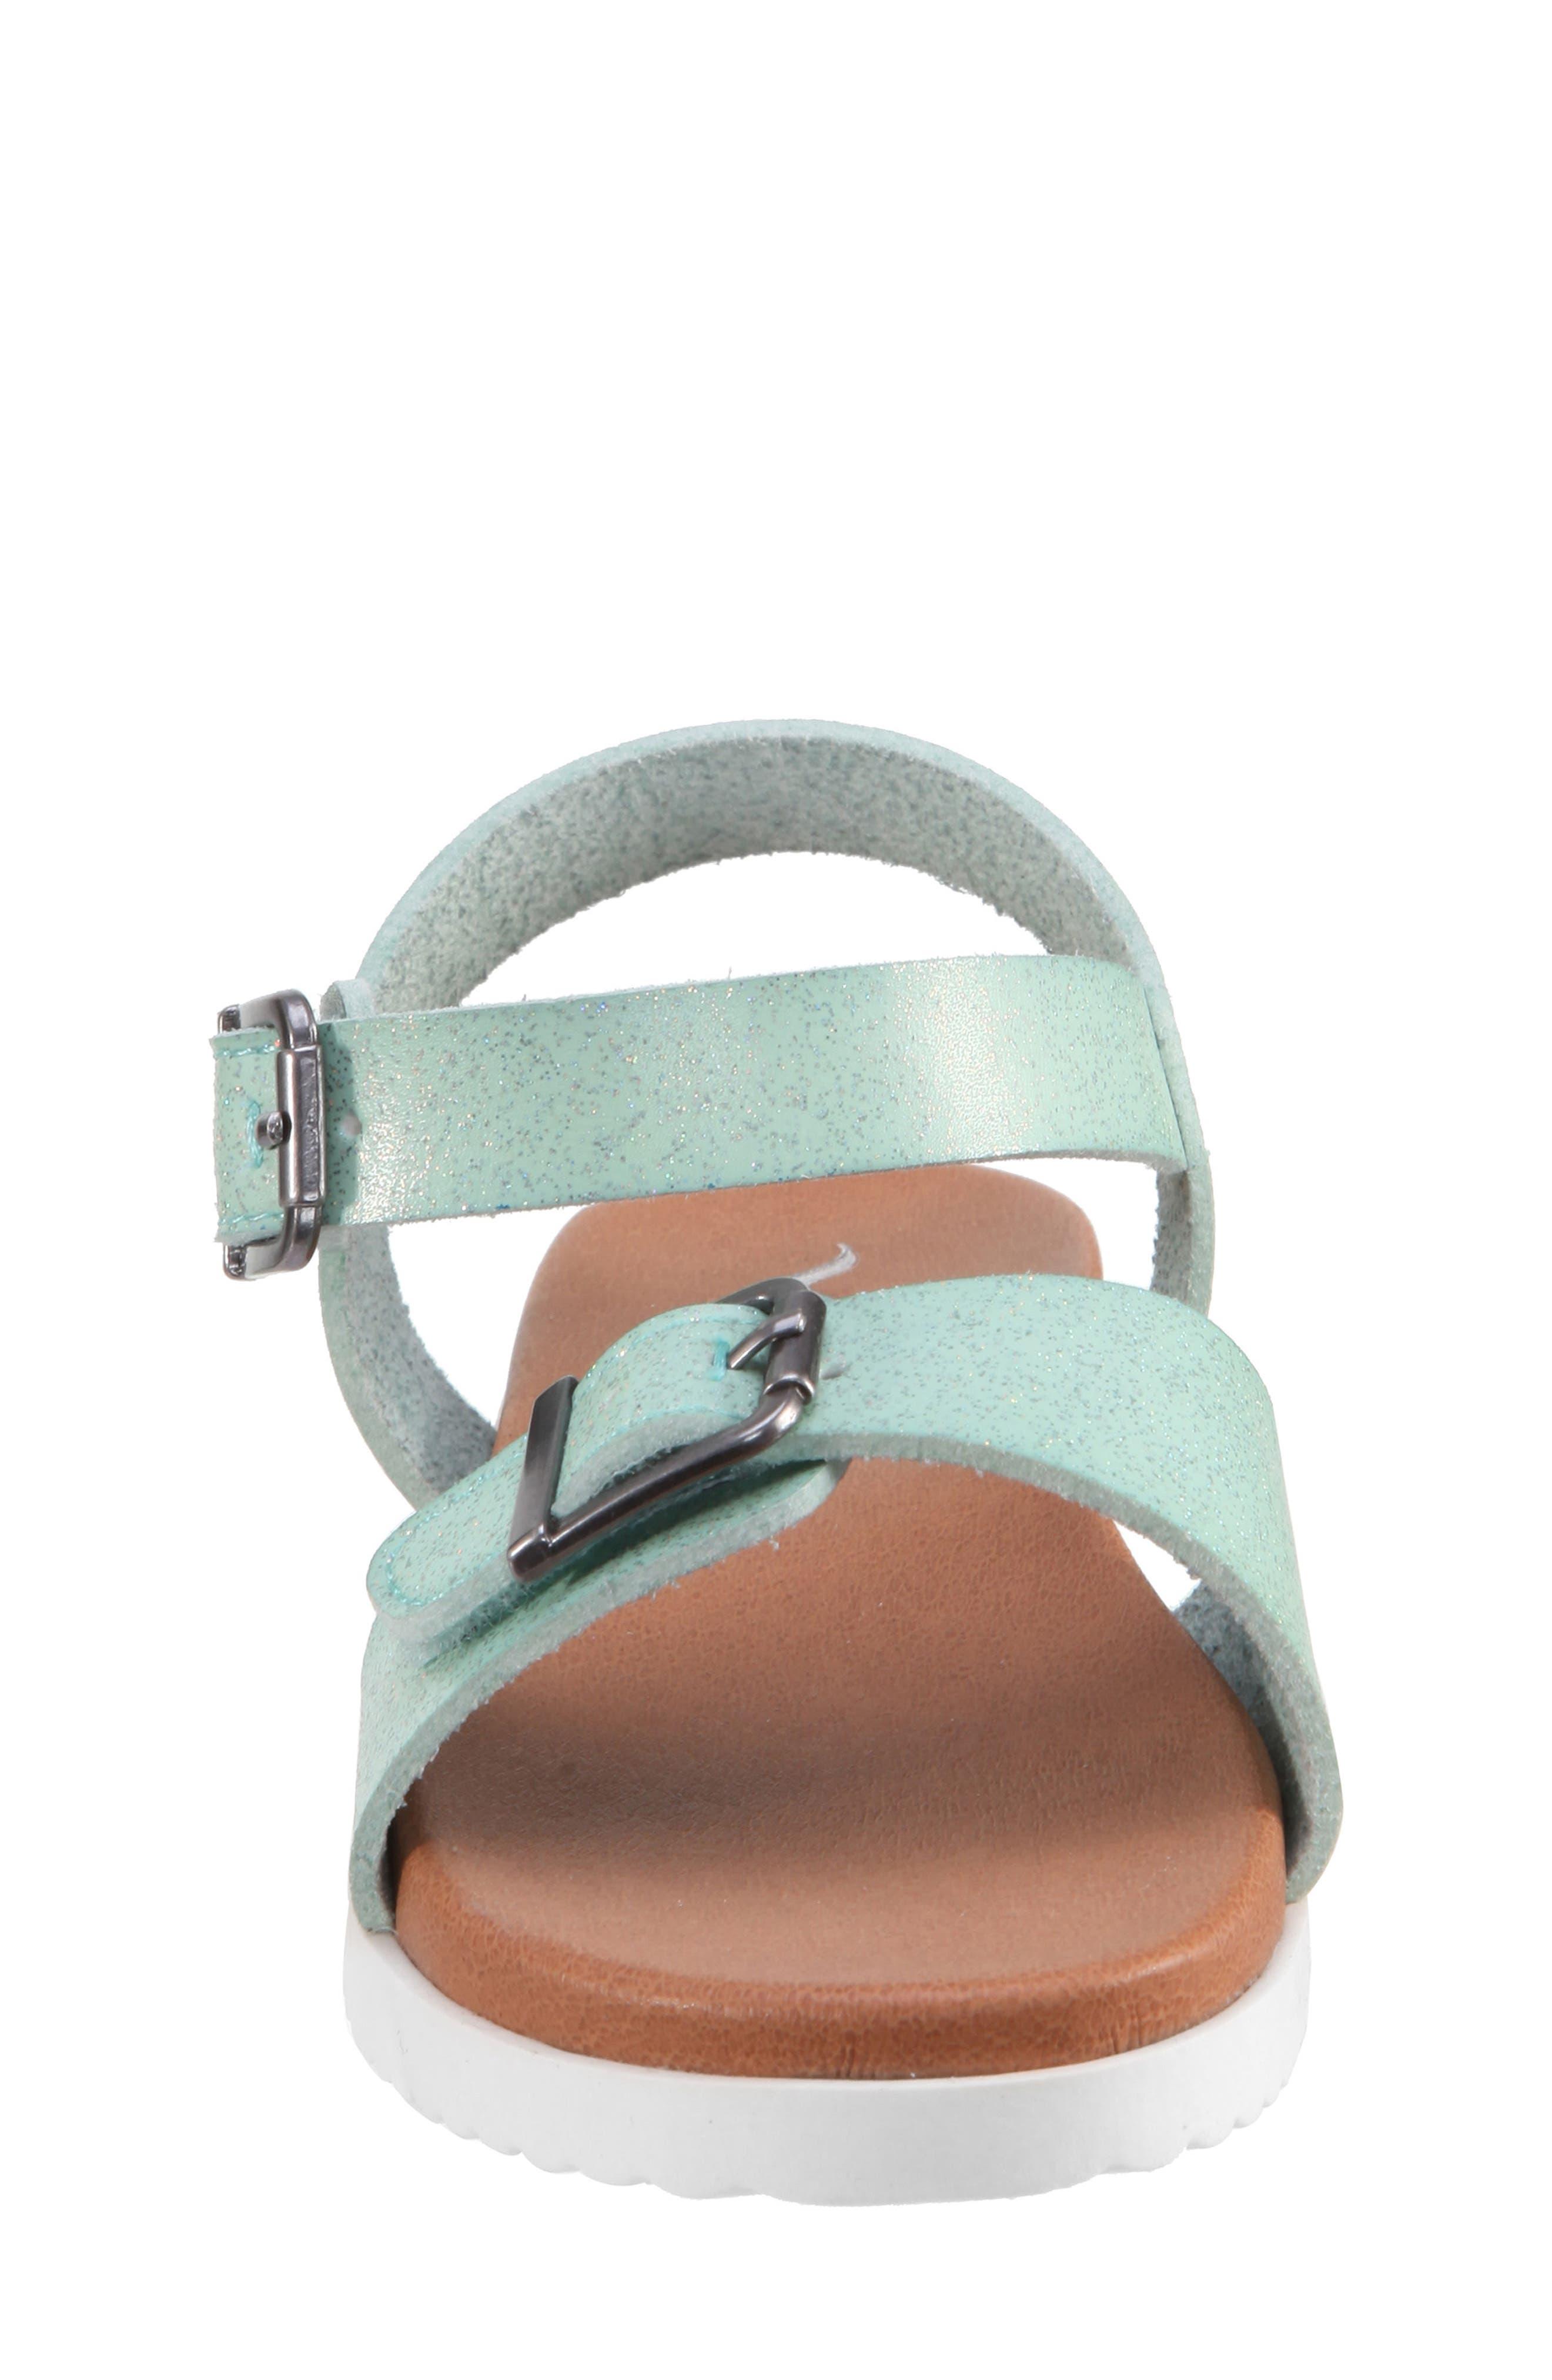 Jacklin3 Quarter Strap Sandal,                             Alternate thumbnail 4, color,                             Mint Dip Dye